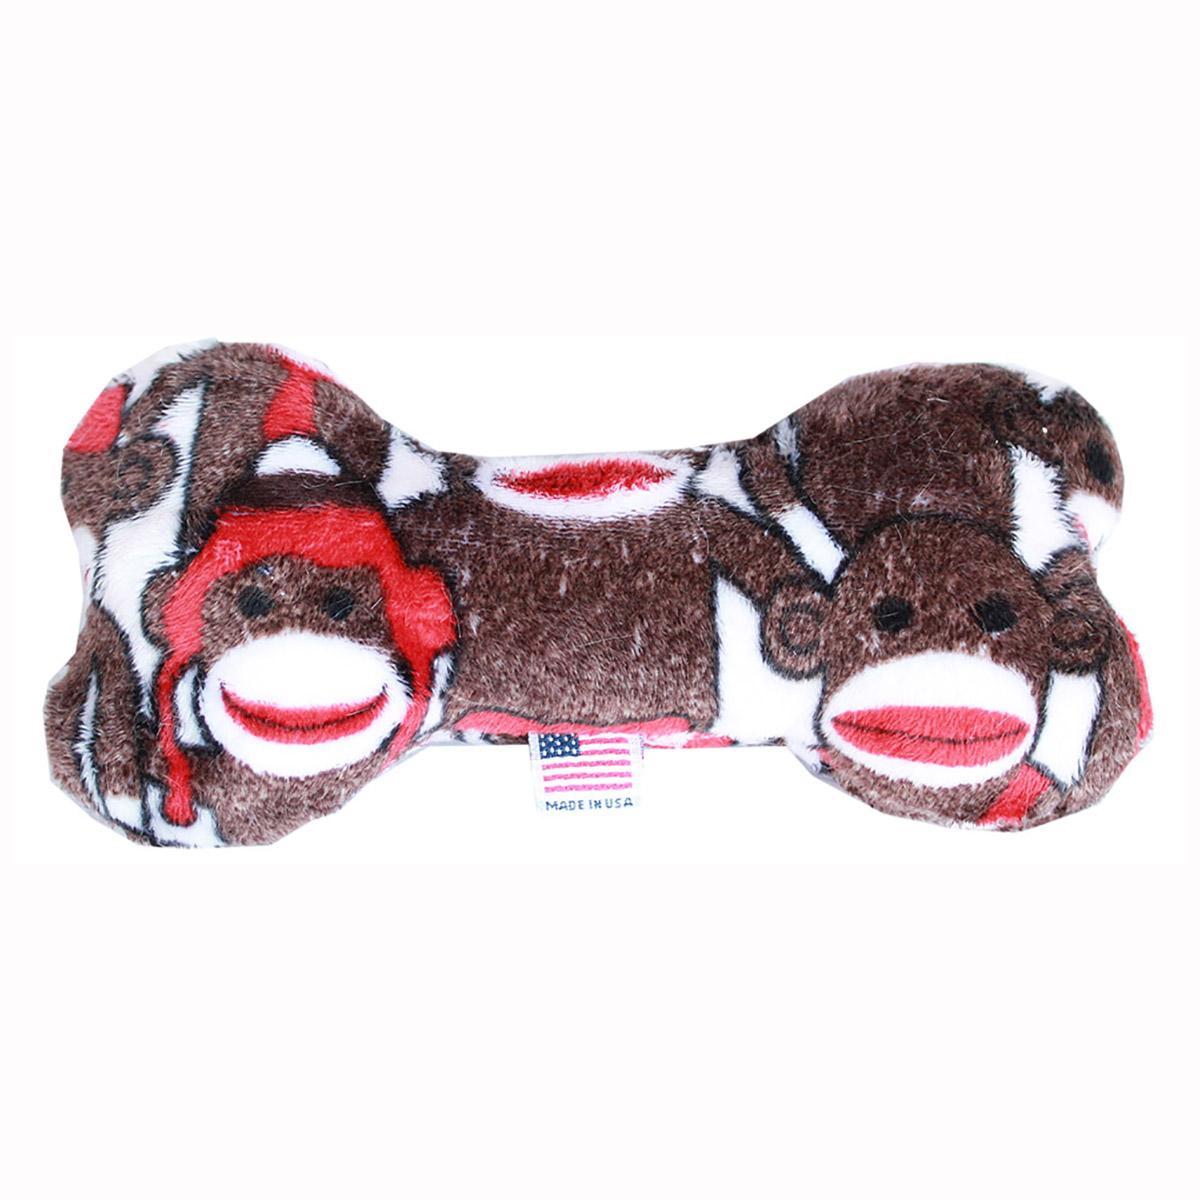 Plush Bone Dog Toy - Sock Monkey